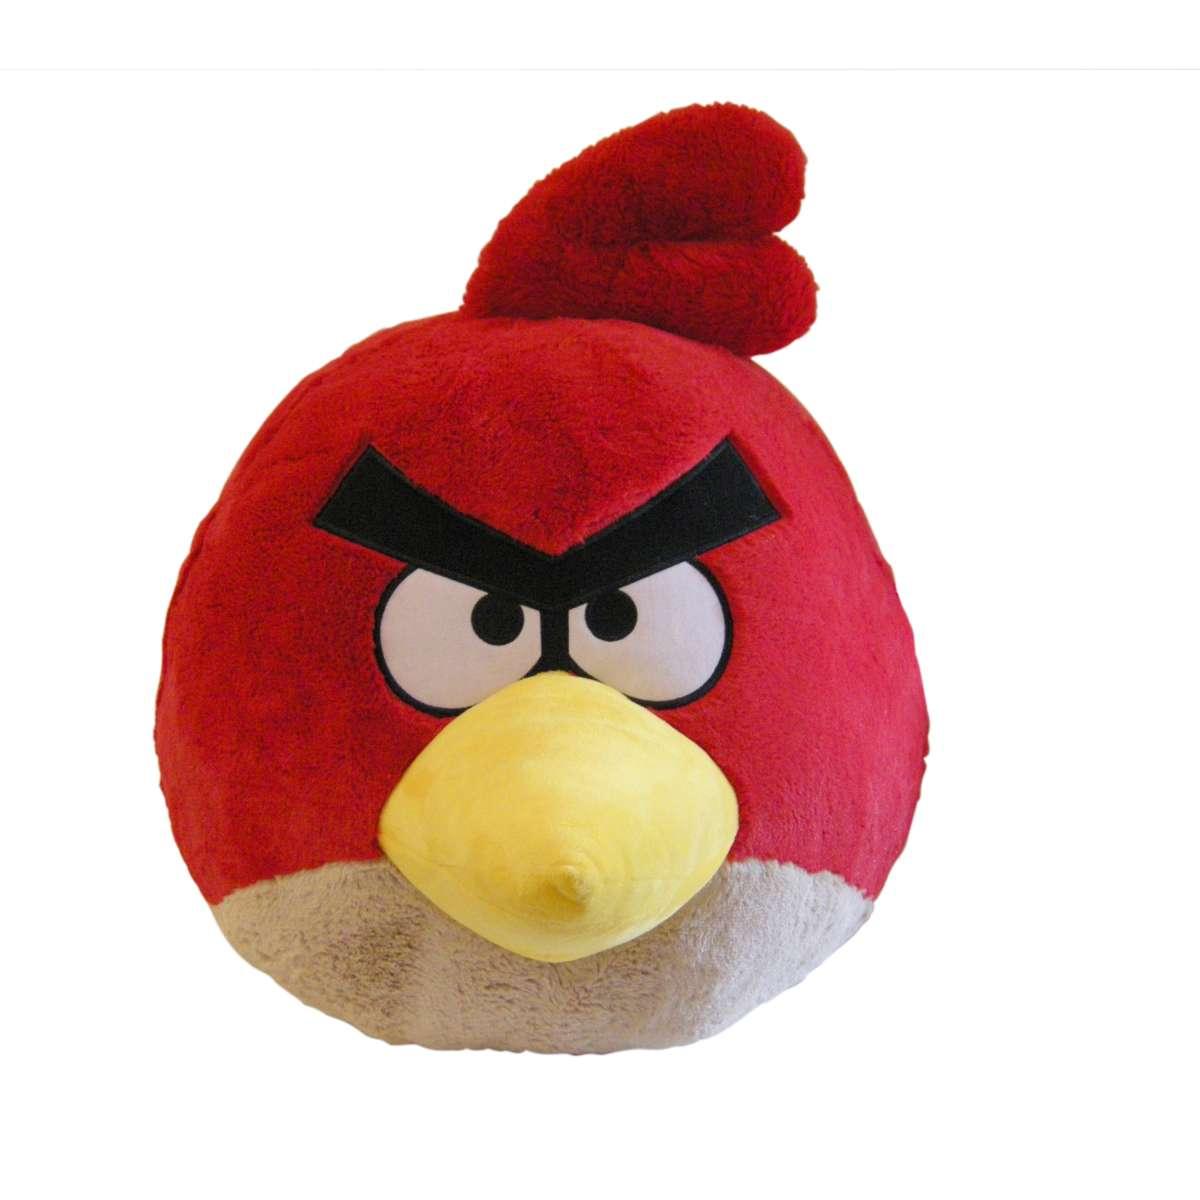 Angry Birds мягкая игрушка 40см, со звуком, красная птица (арт. 91205)Мягкие игрушки<br><br><br>Артикул: 91205<br>Бренд: 1 TOY<br>Категории: Angry Birds